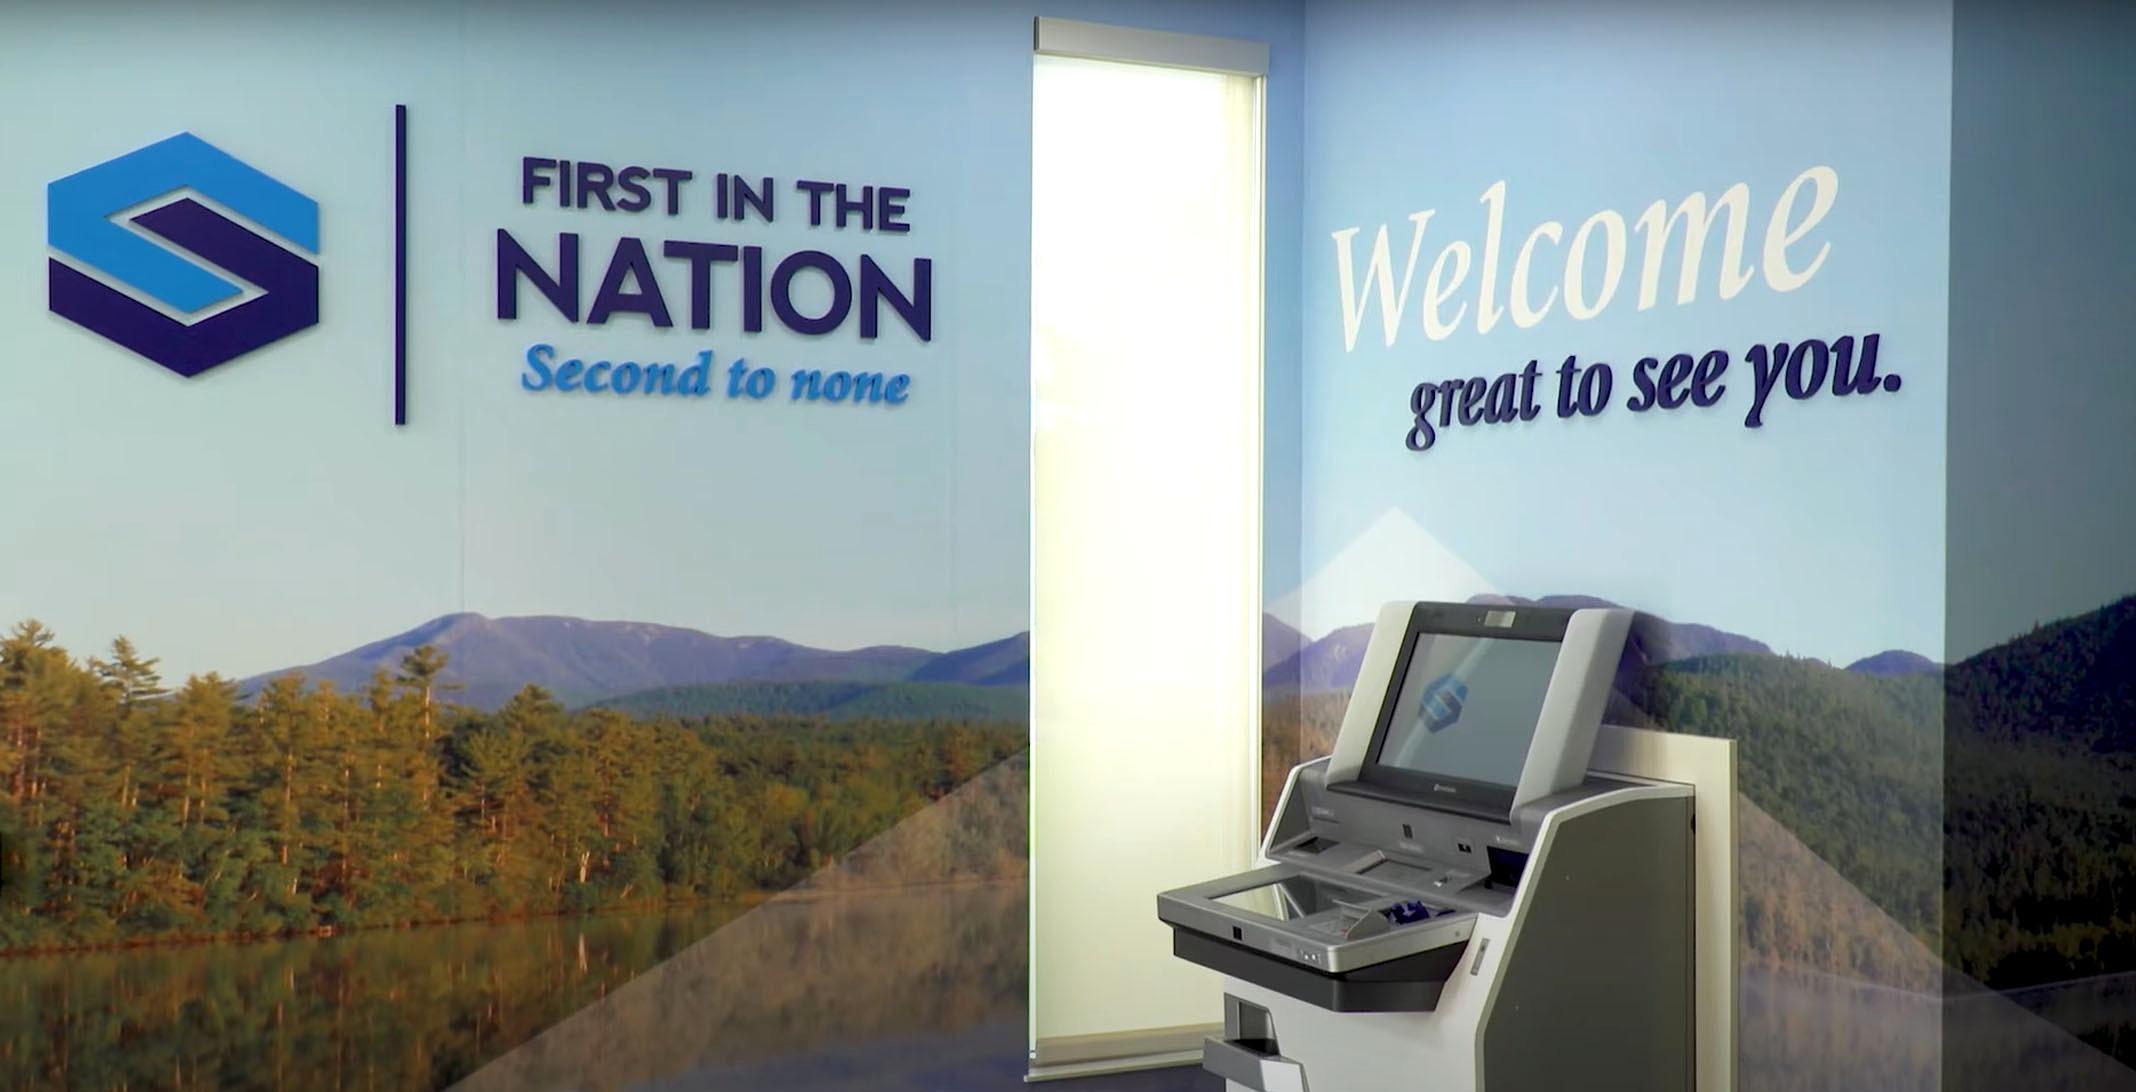 St. Mary's Bank ITM Machine